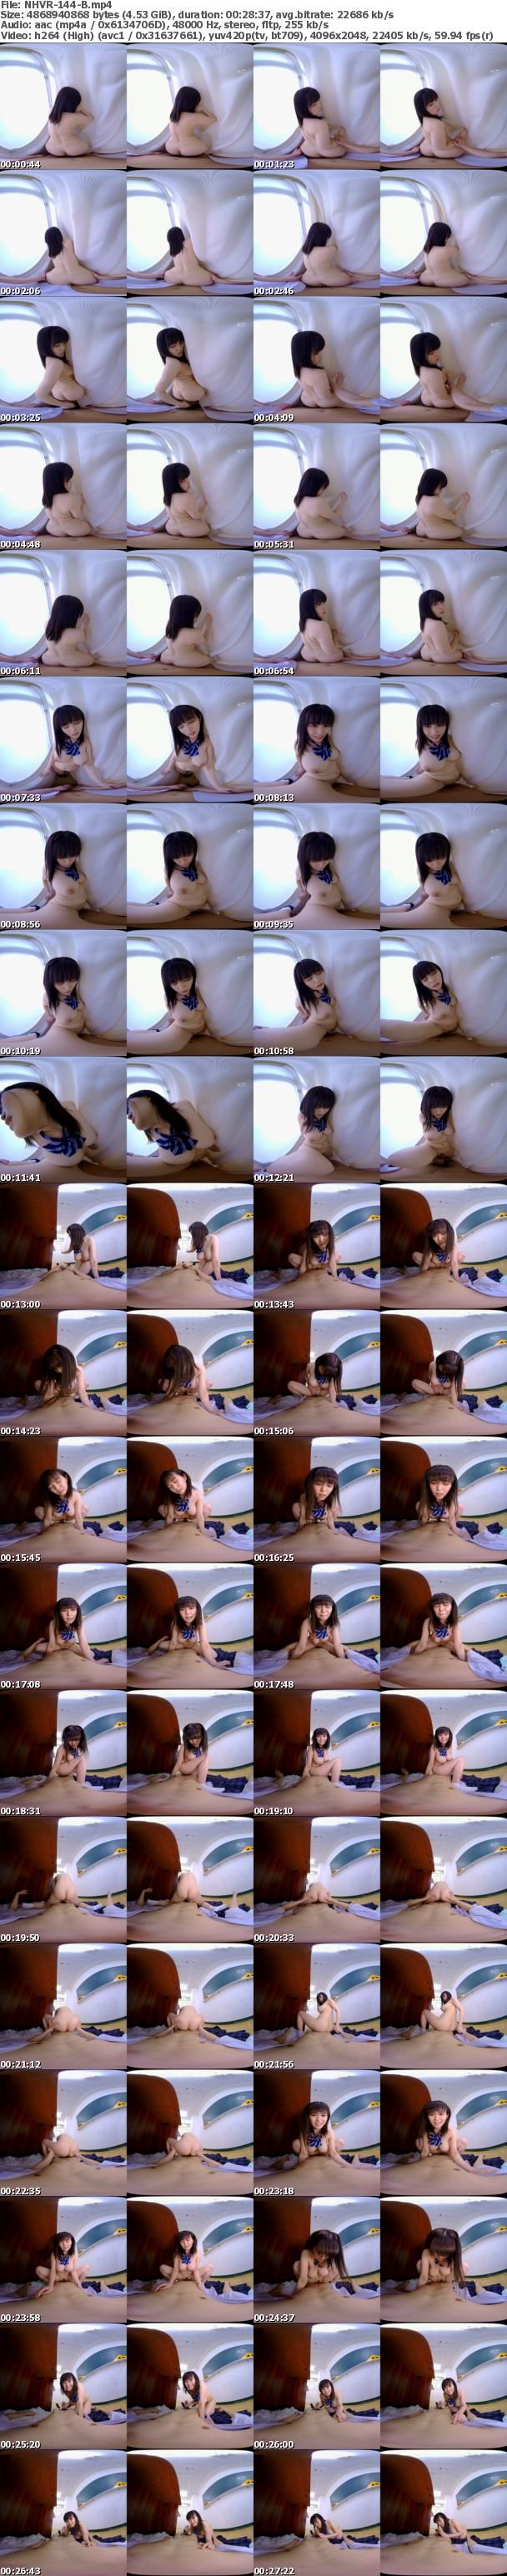 (VR) NHVR-144 カーテンの中…教壇の陰…に隠れてドキドキ青春SEX 僕の彼女はむっつりドスケベ生徒会長